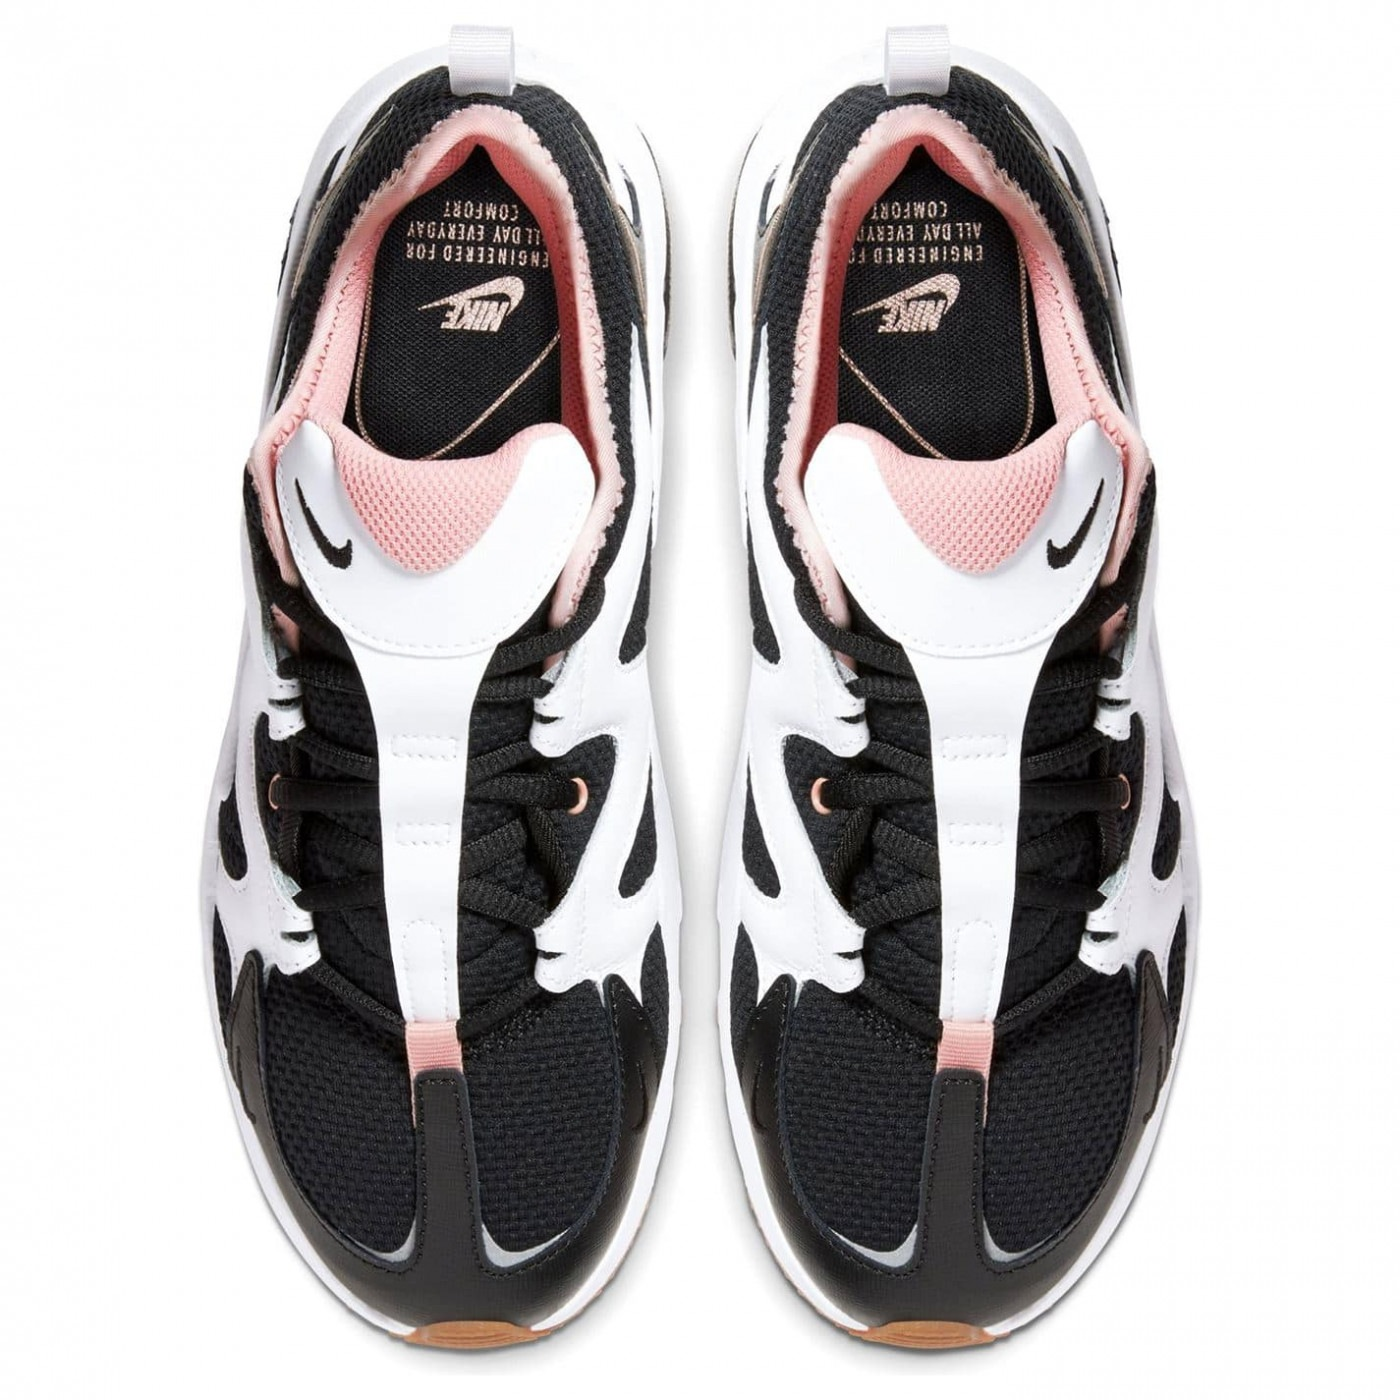 Nike Ladies Air Max Graviton Trainers